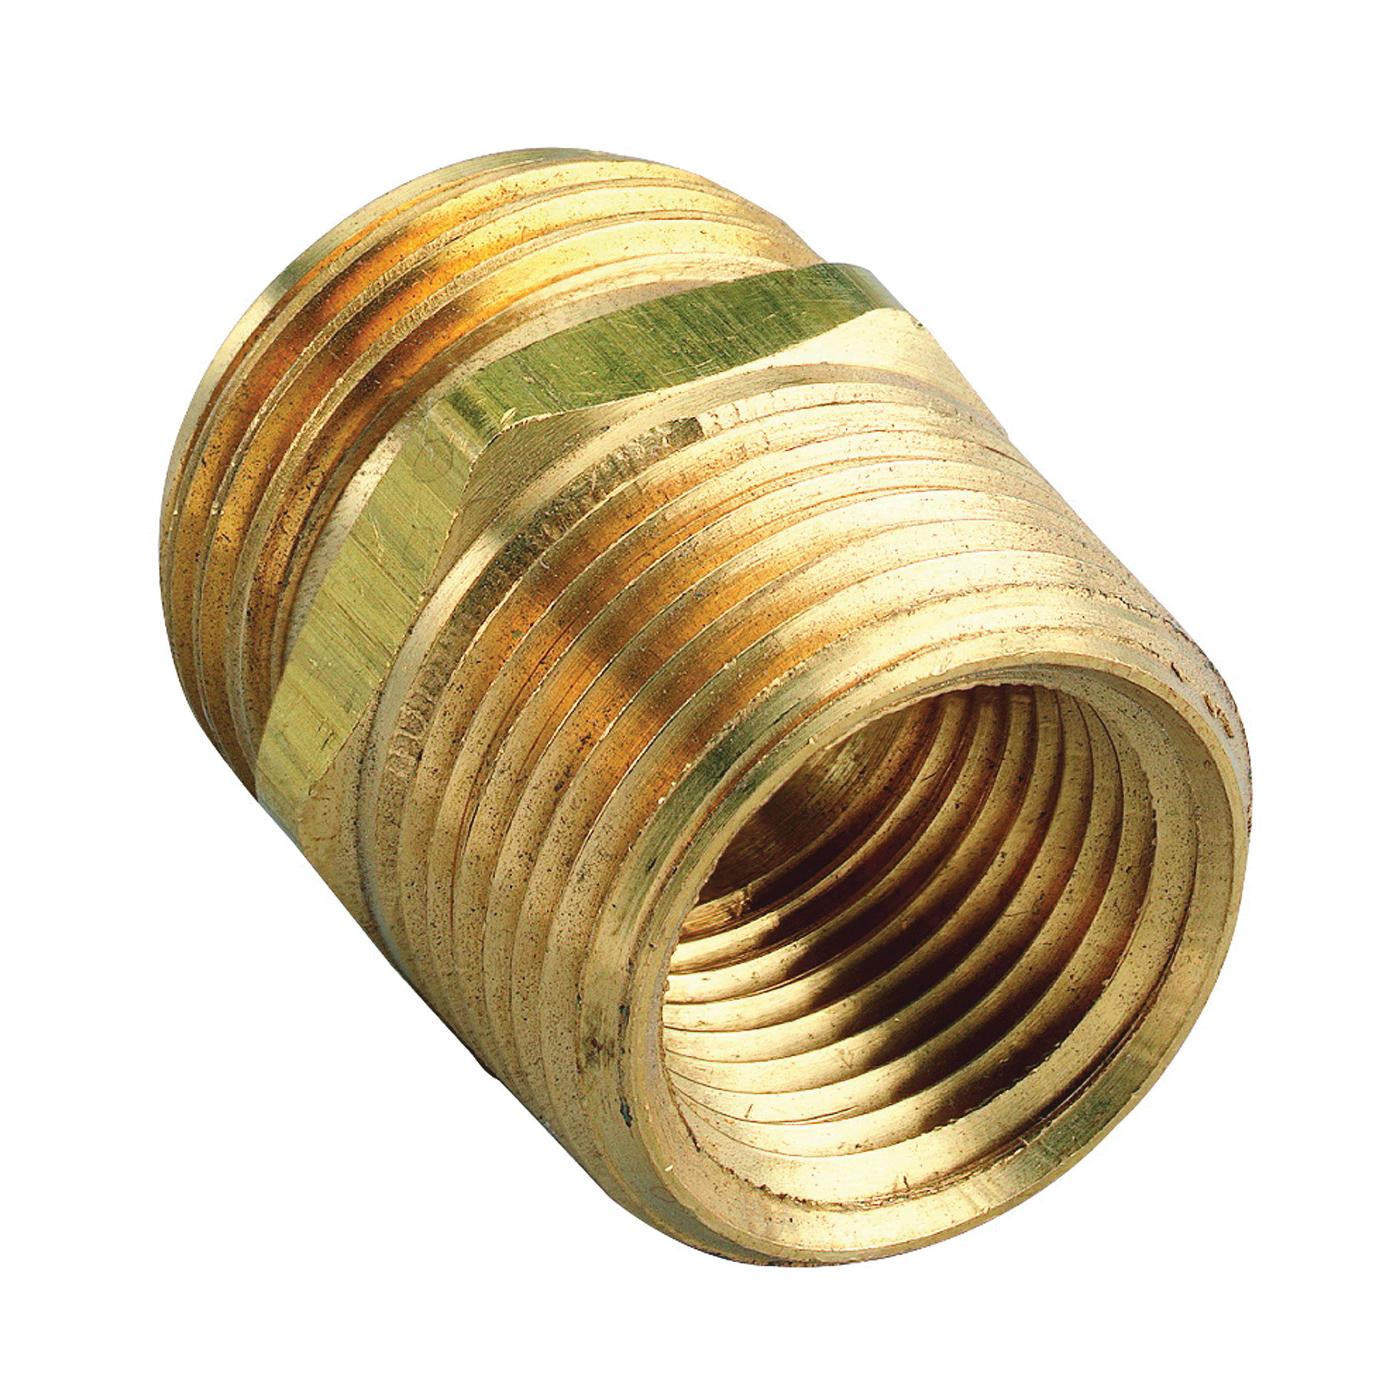 Picture of Orbit 53038 Hose to Pipe Adapter, 3/4 x 3/4 x 1/2 in, MHT x MNPT x FNPT, Brass